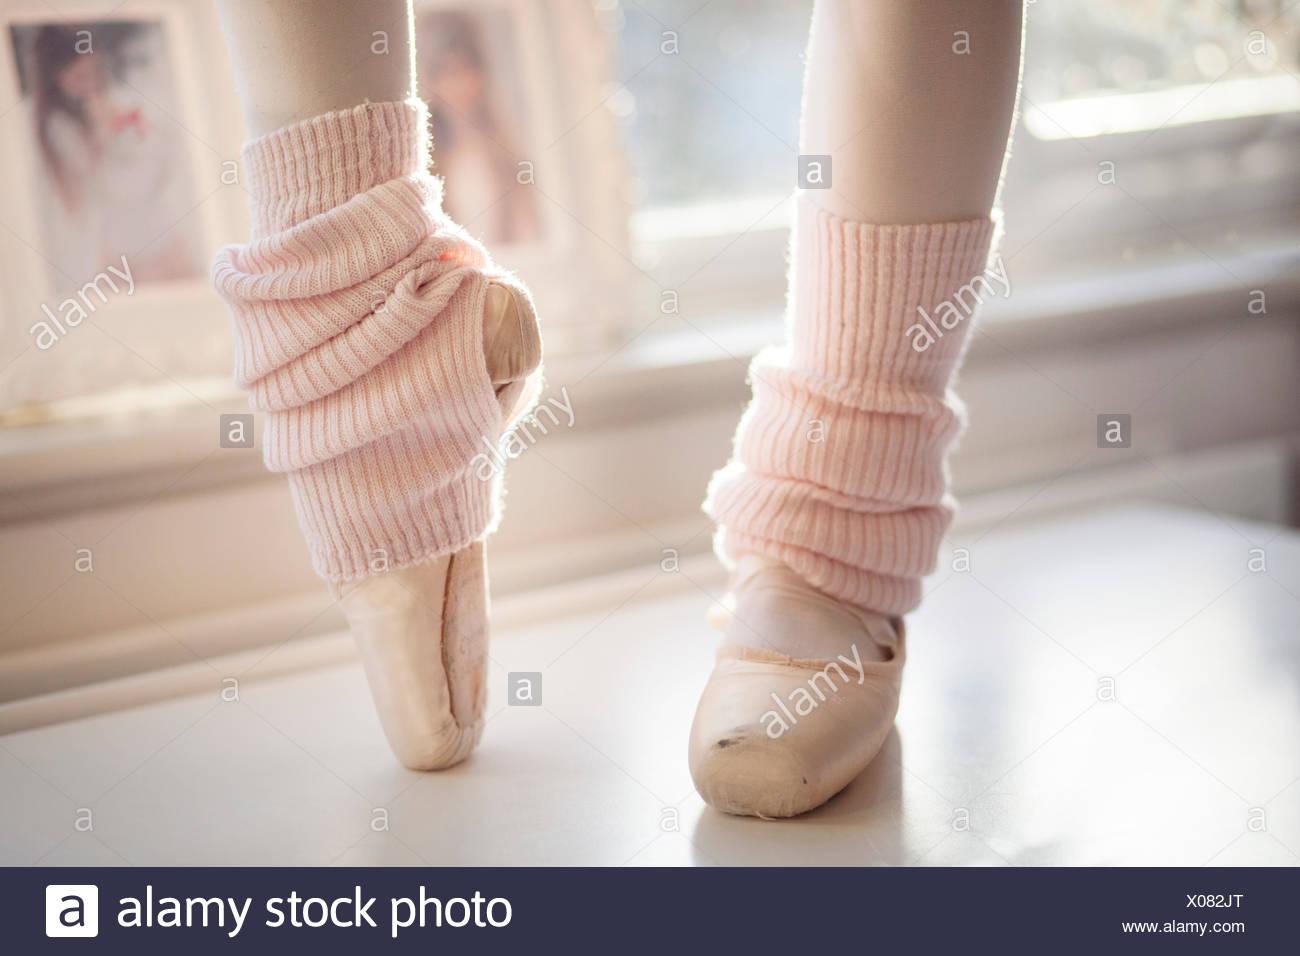 Leg Warmers Stock Photos & Leg Warmers Stock Images - Alamy